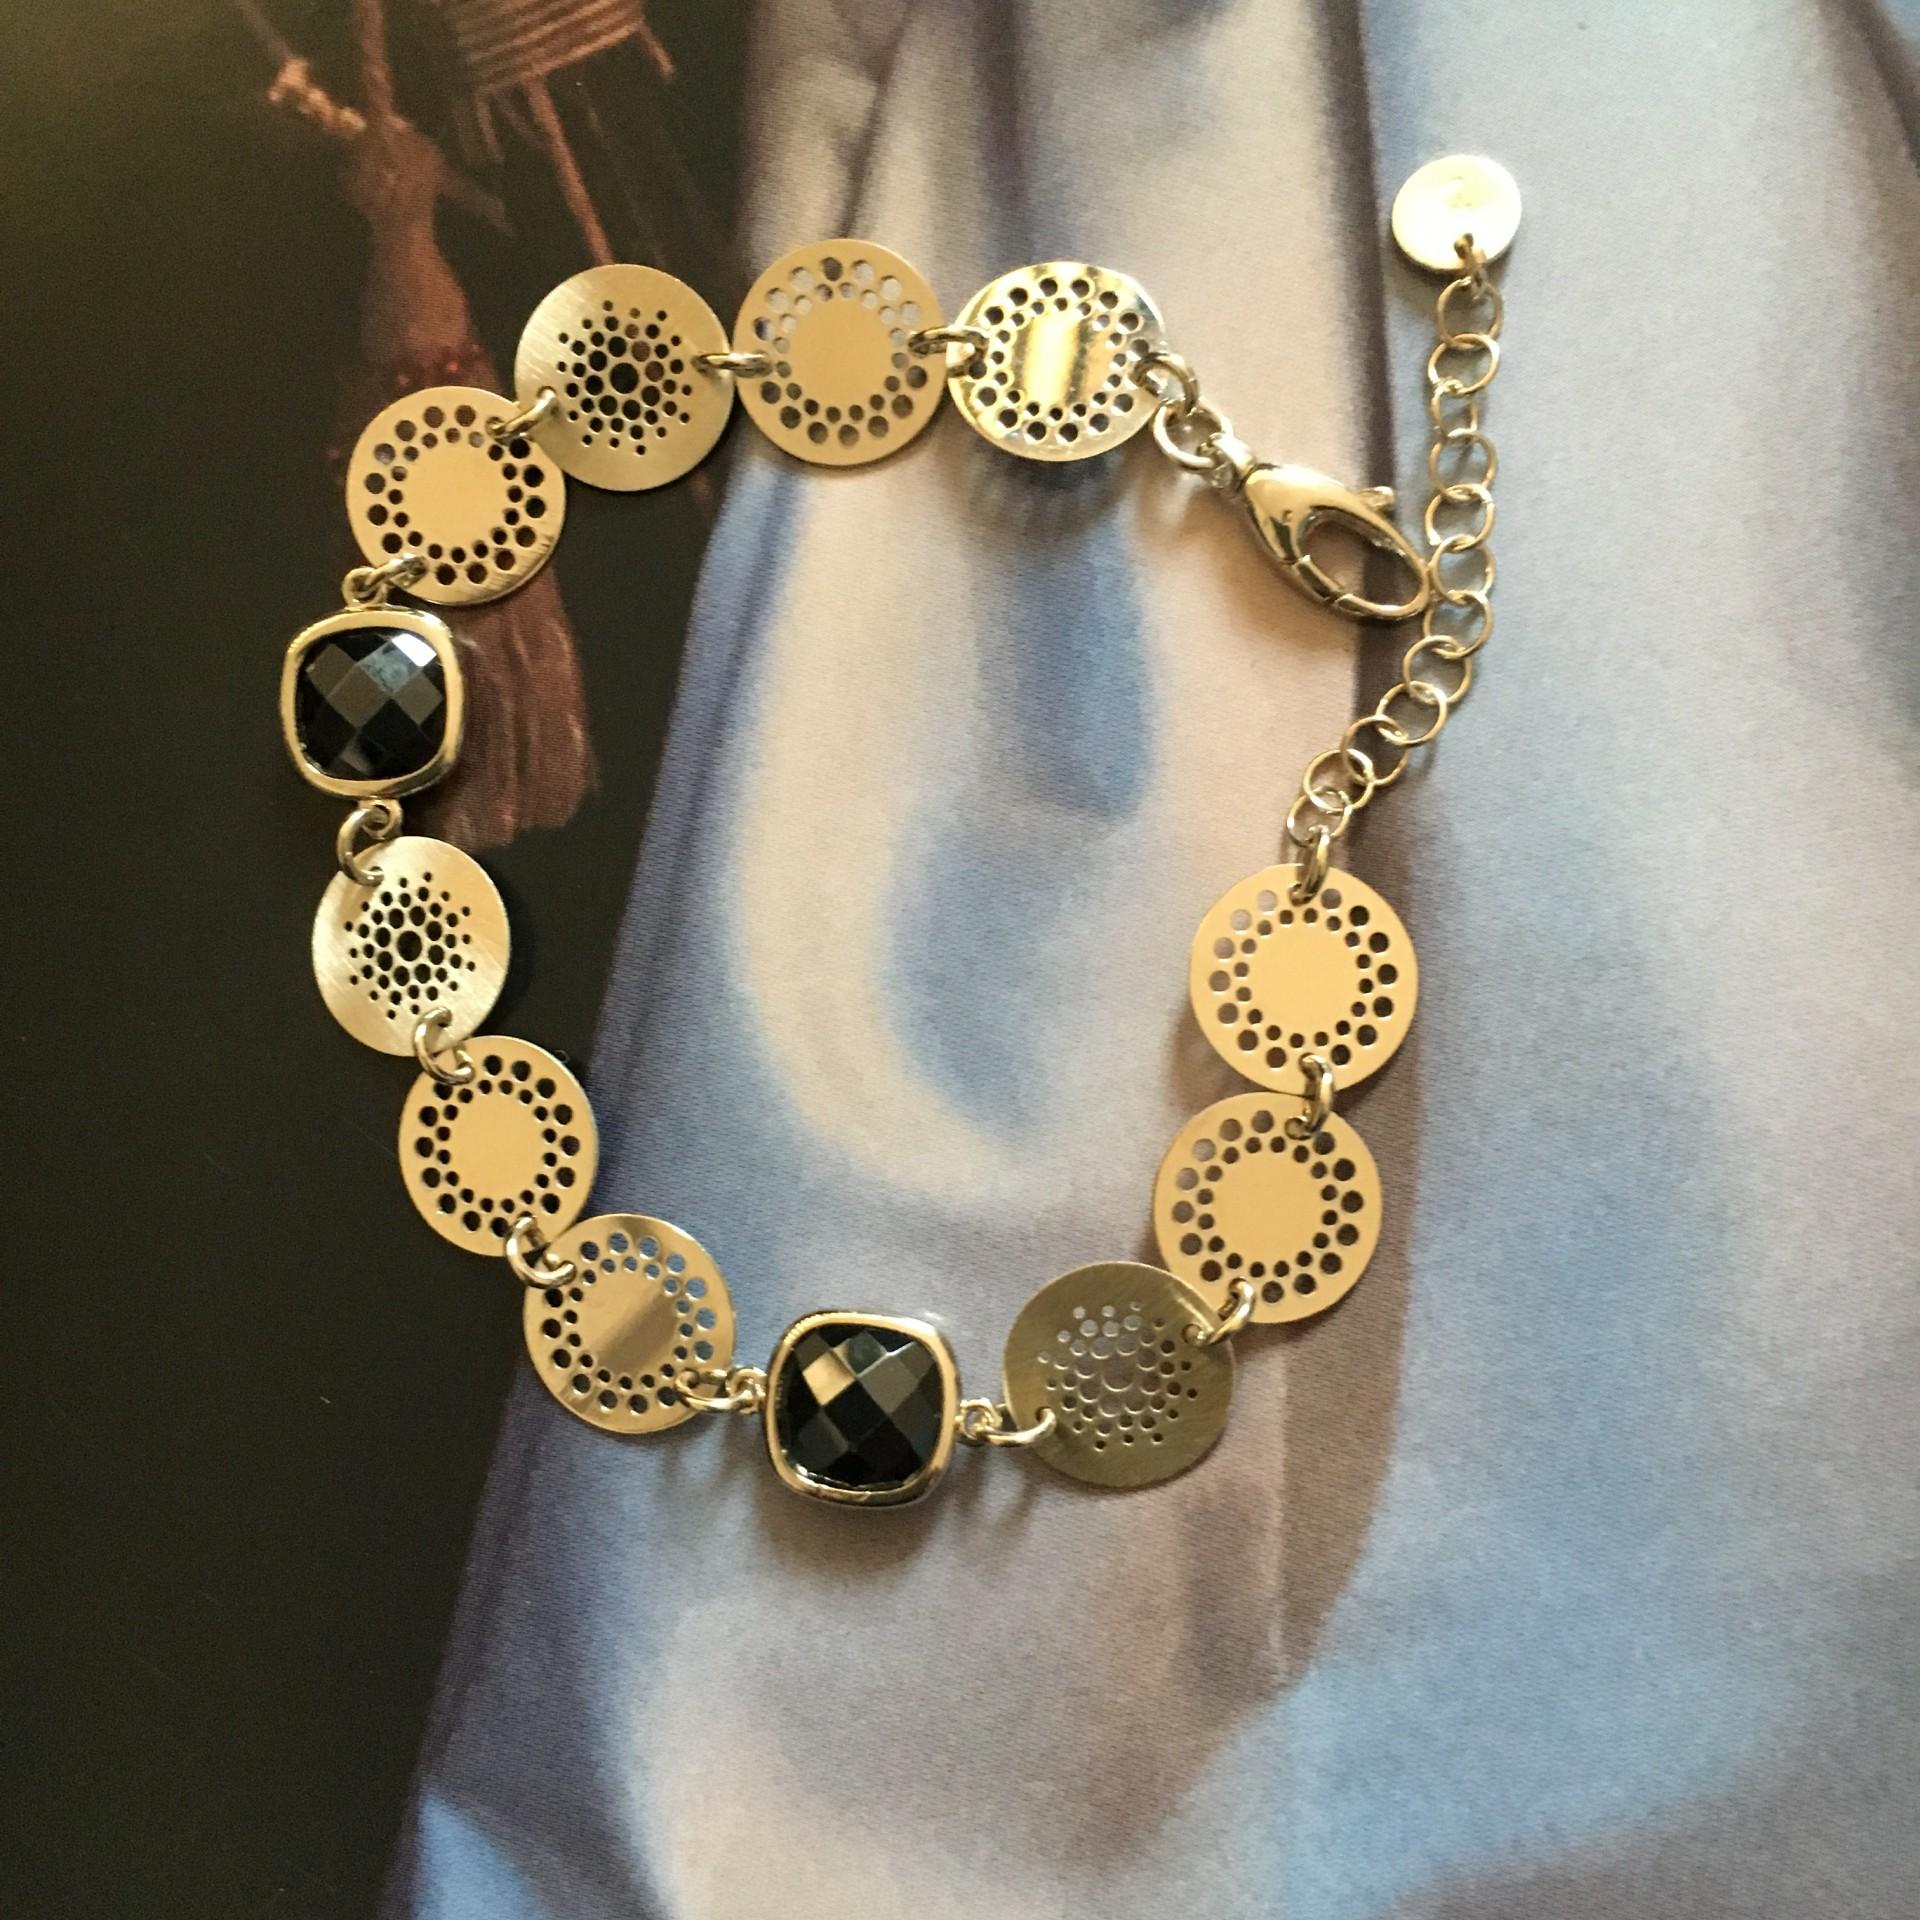 The Vintage Charm II silver bracelet